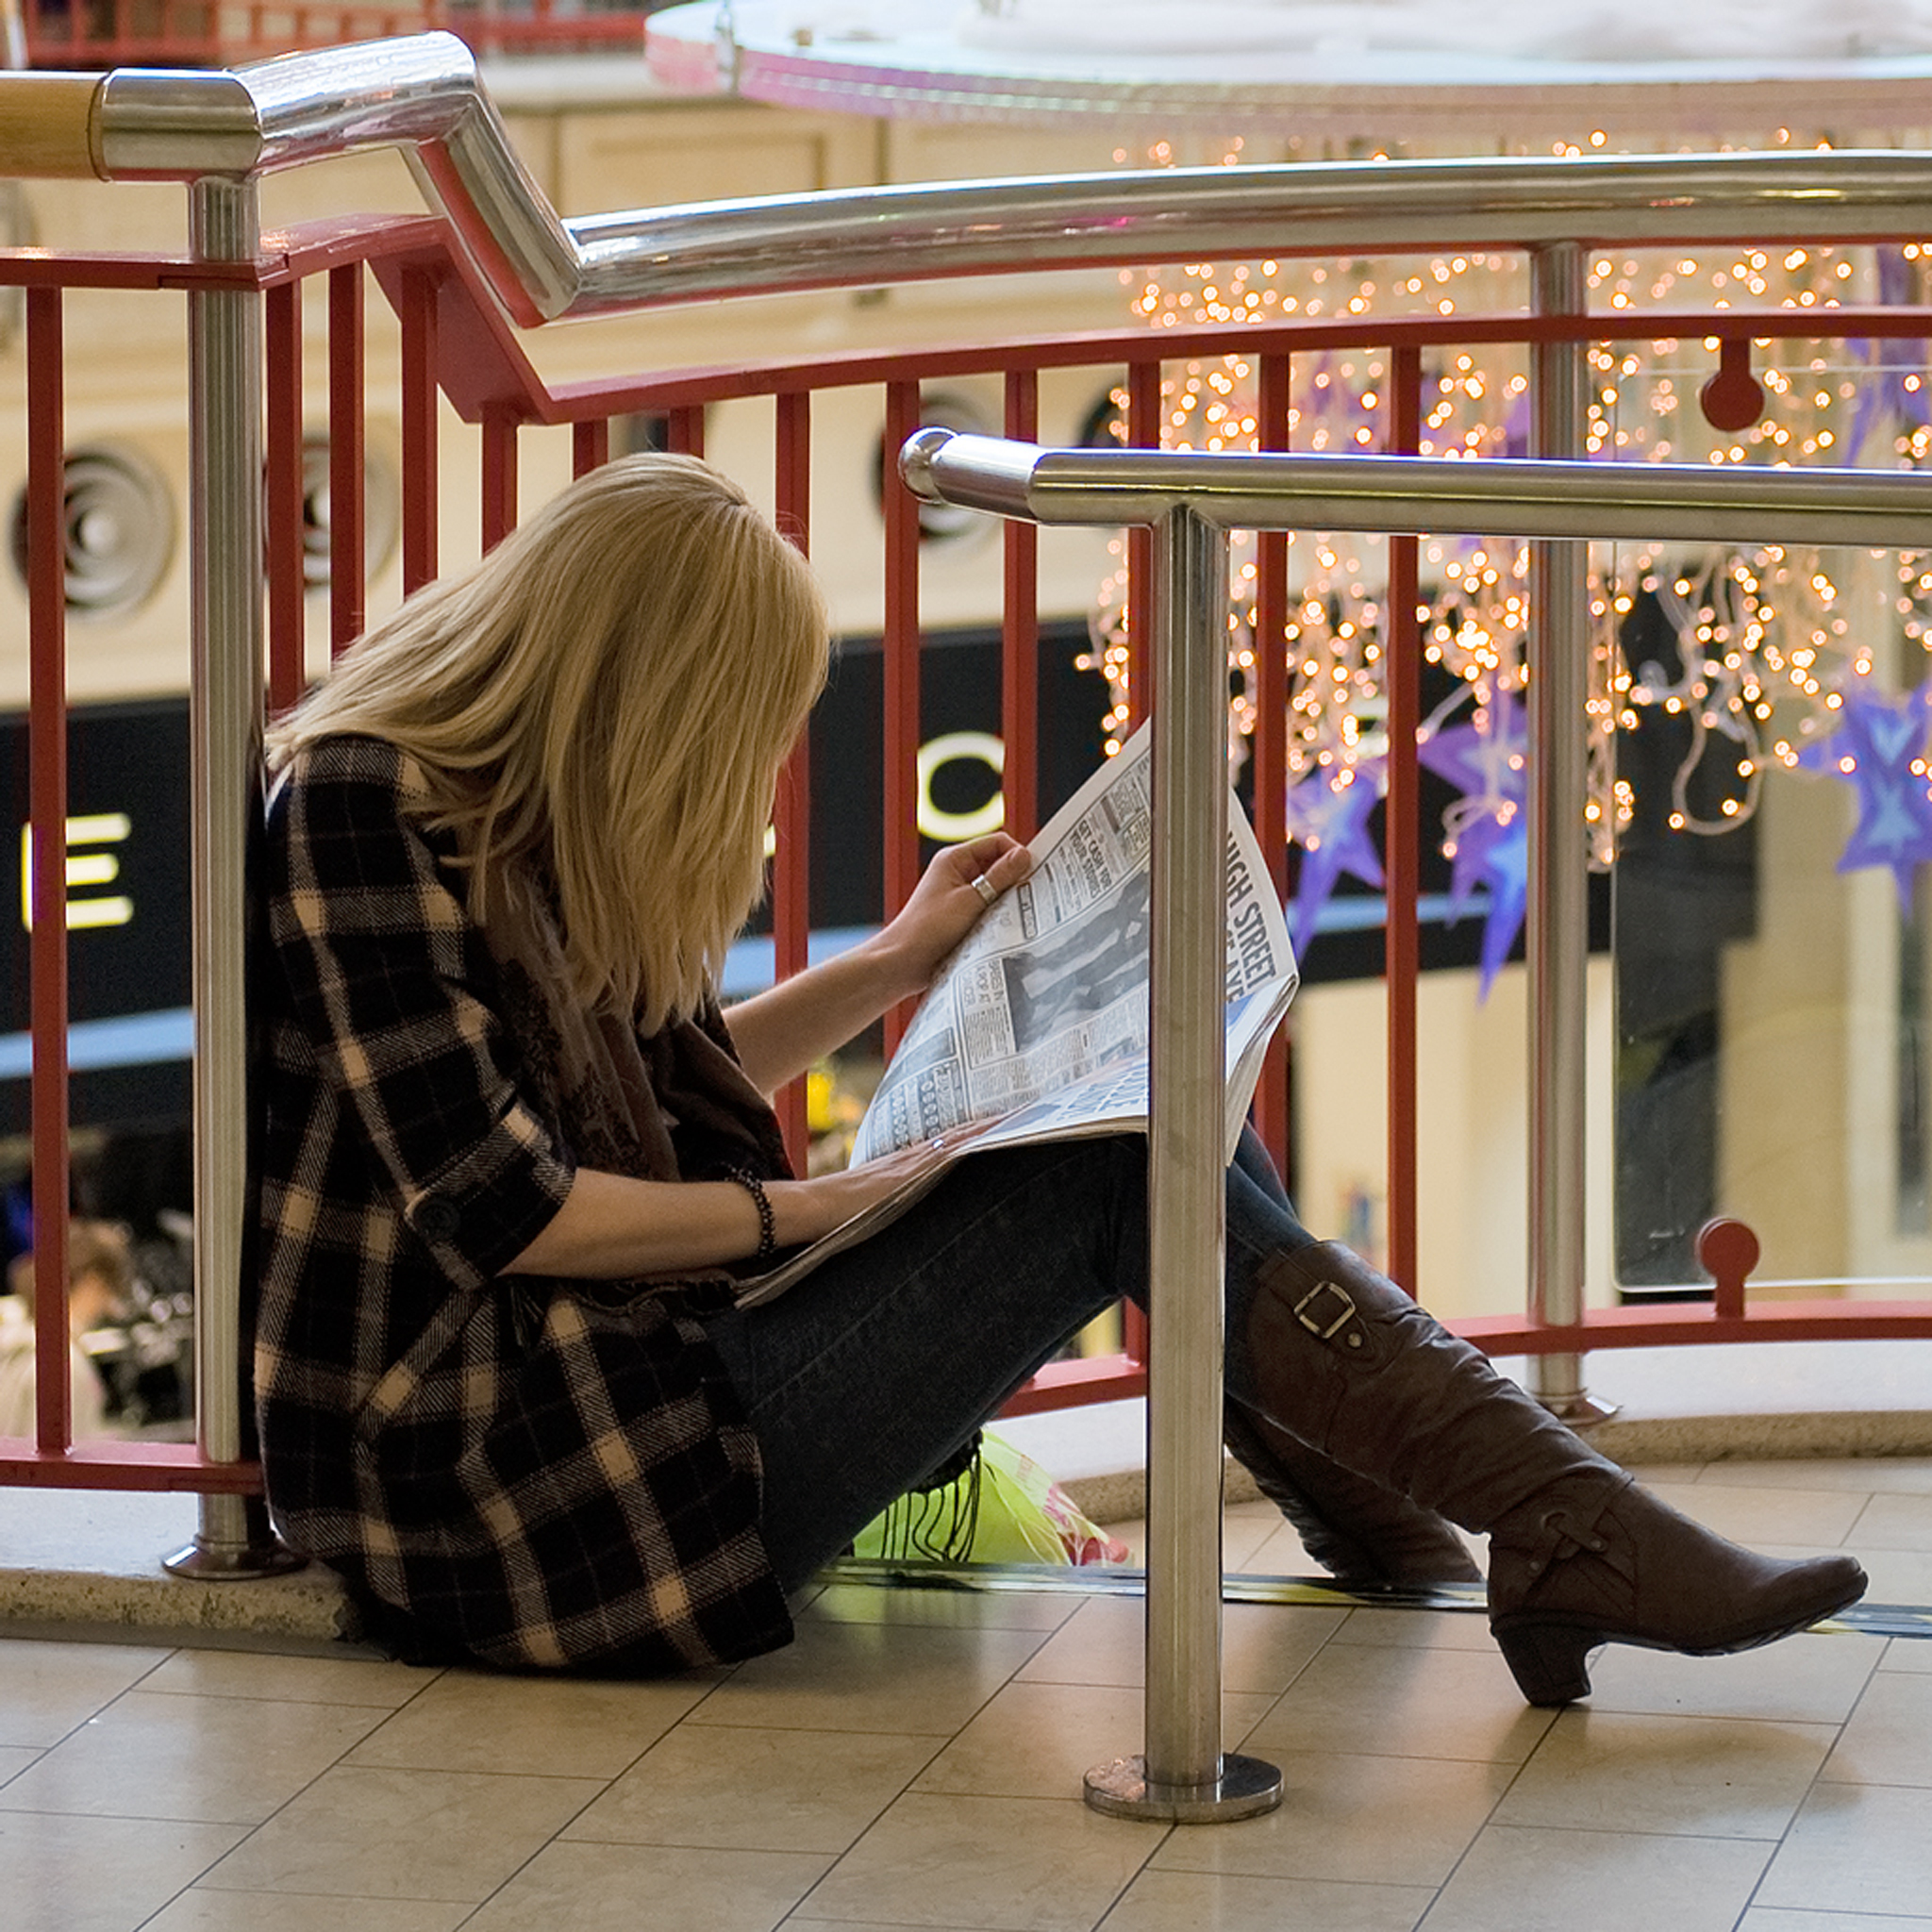 girl-reading-newspaper